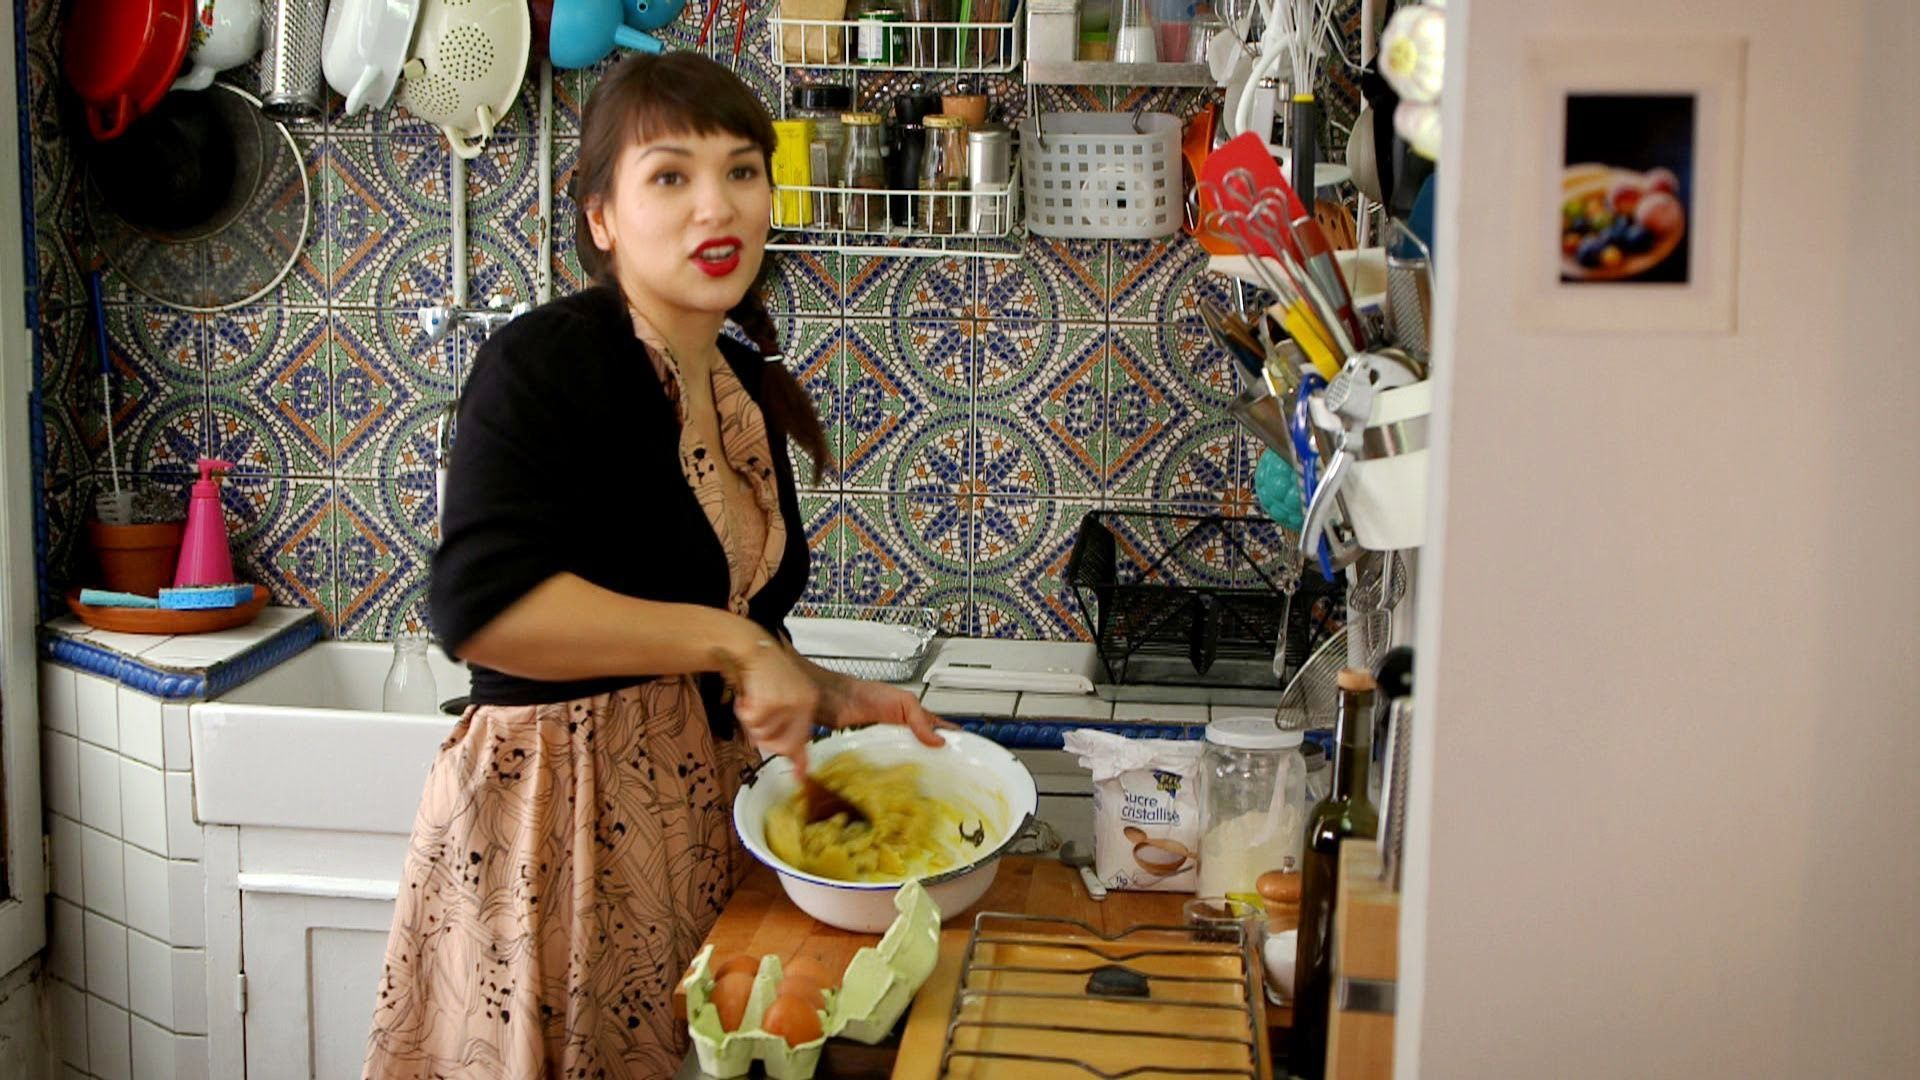 Chouquettes - Little Paris Kitchen - BBC Food | Dessert | Pinterest